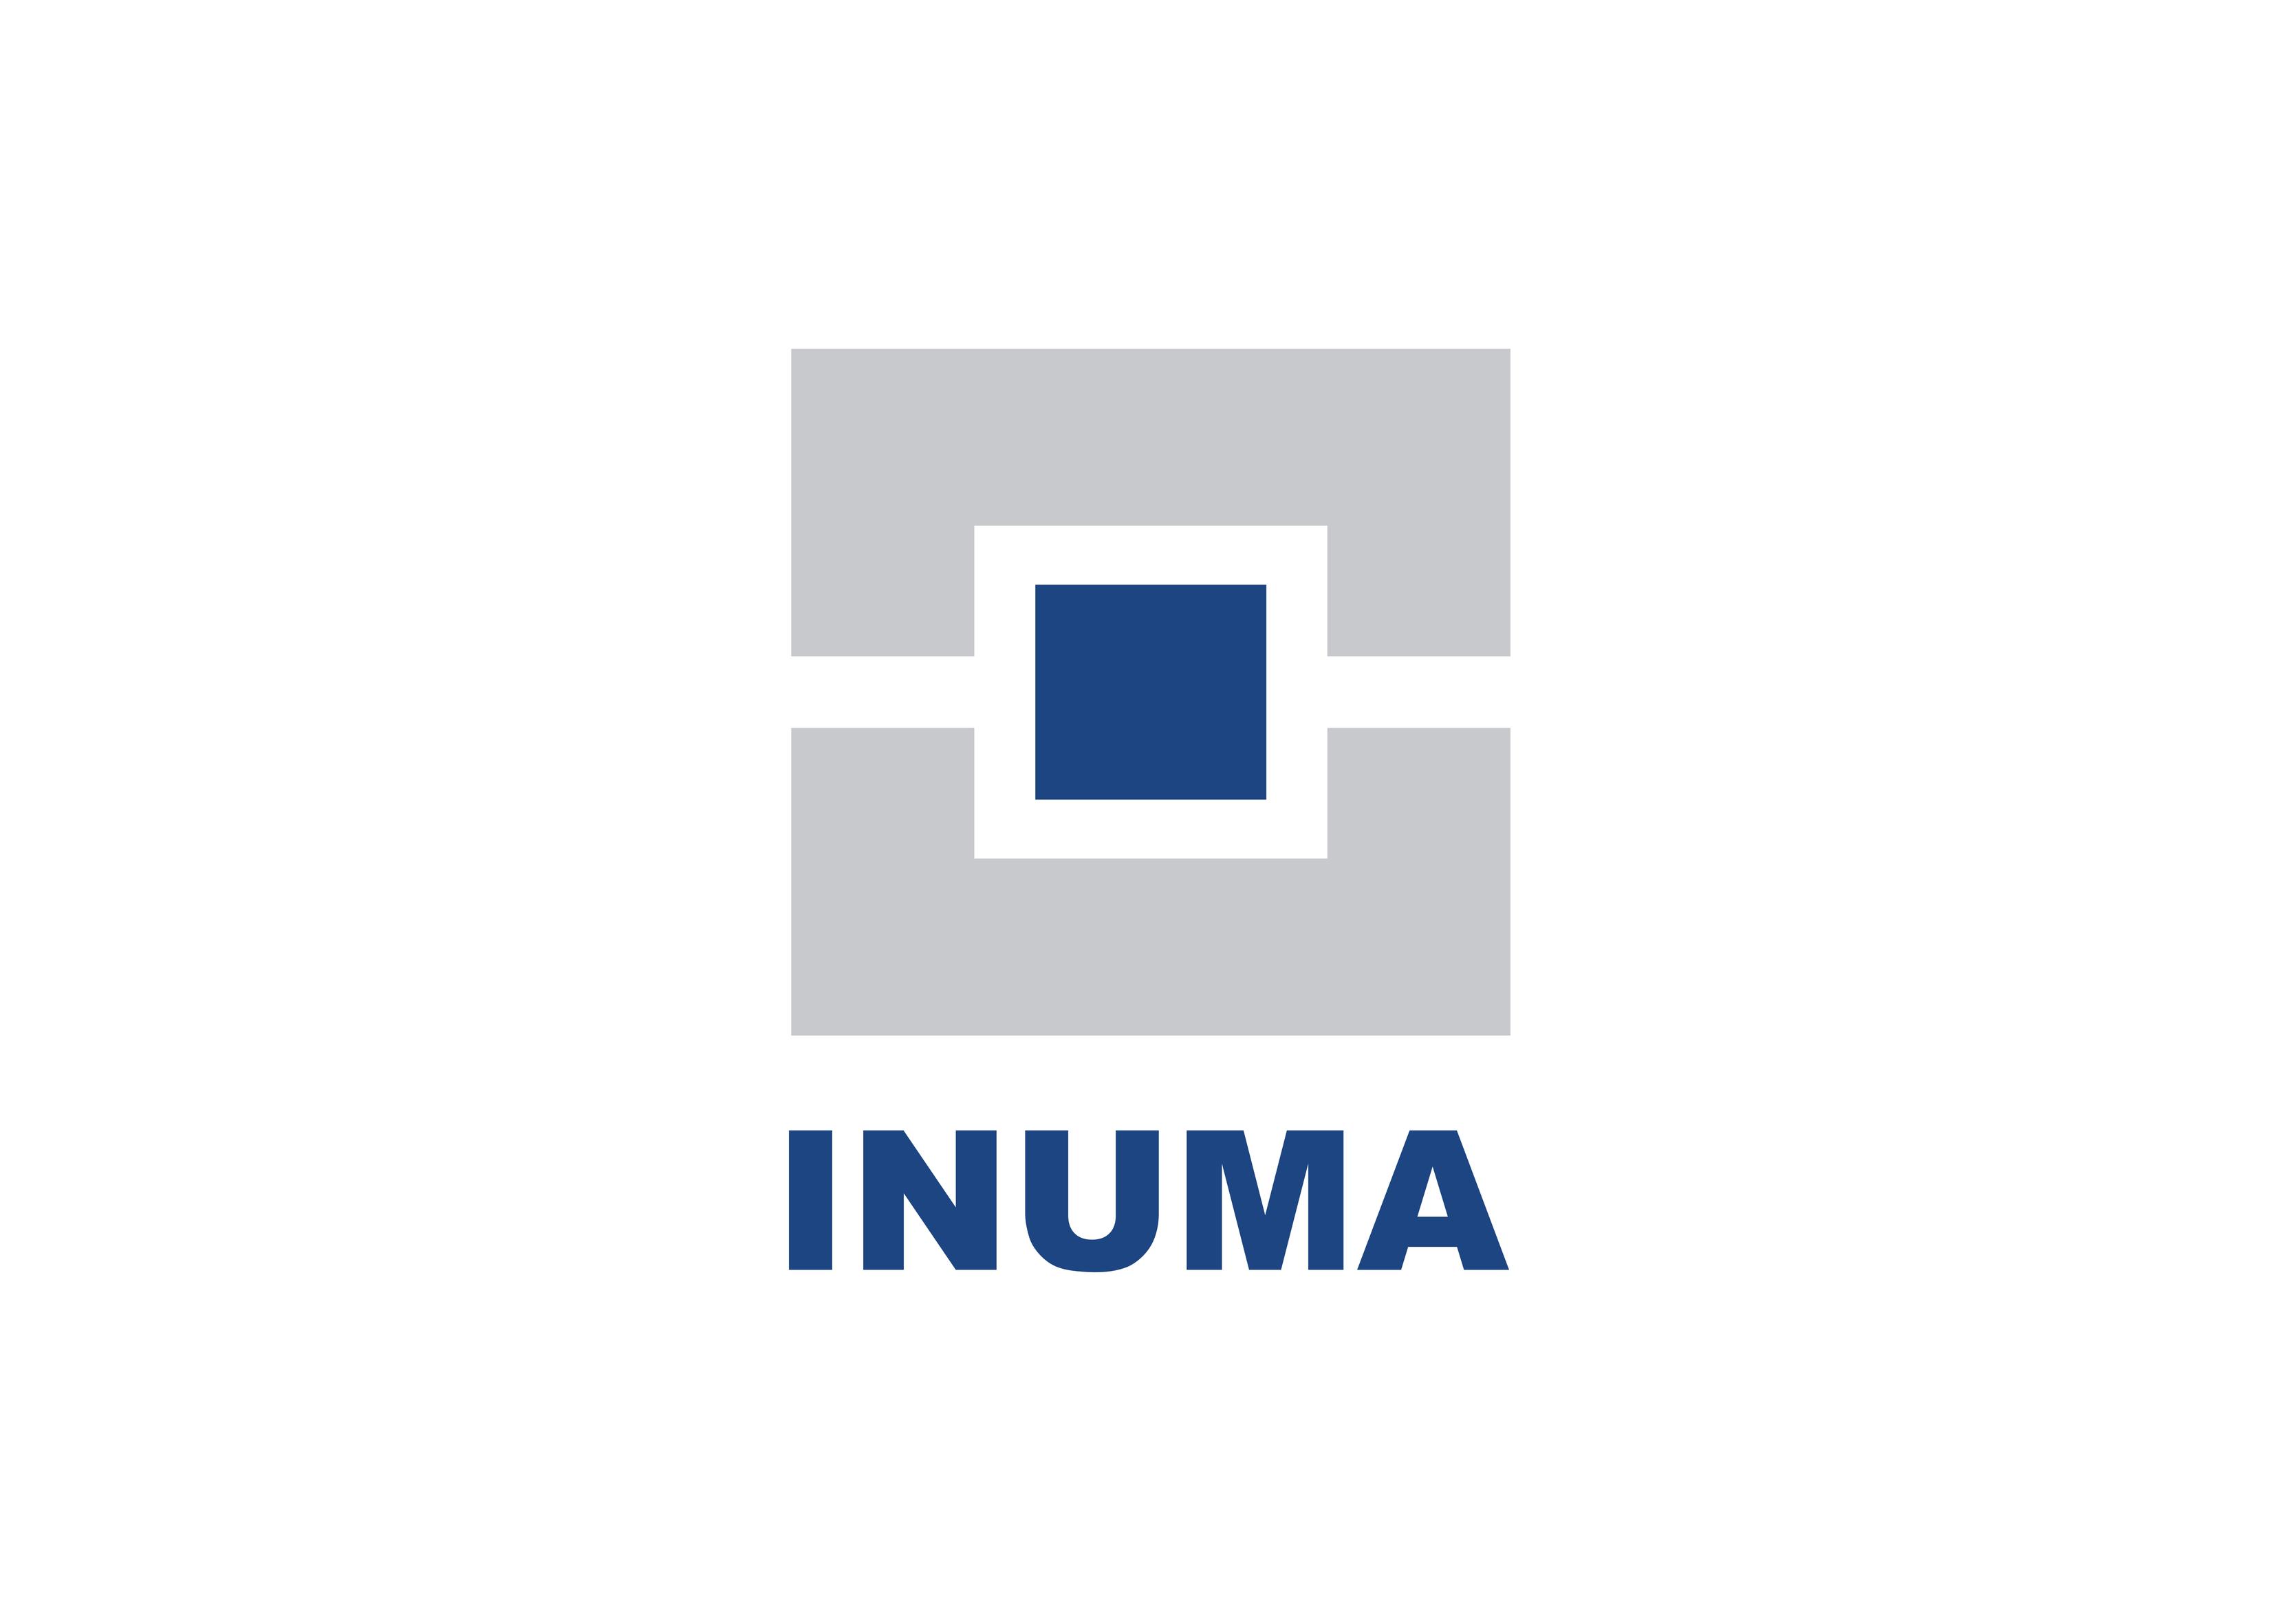 Logo INUMA